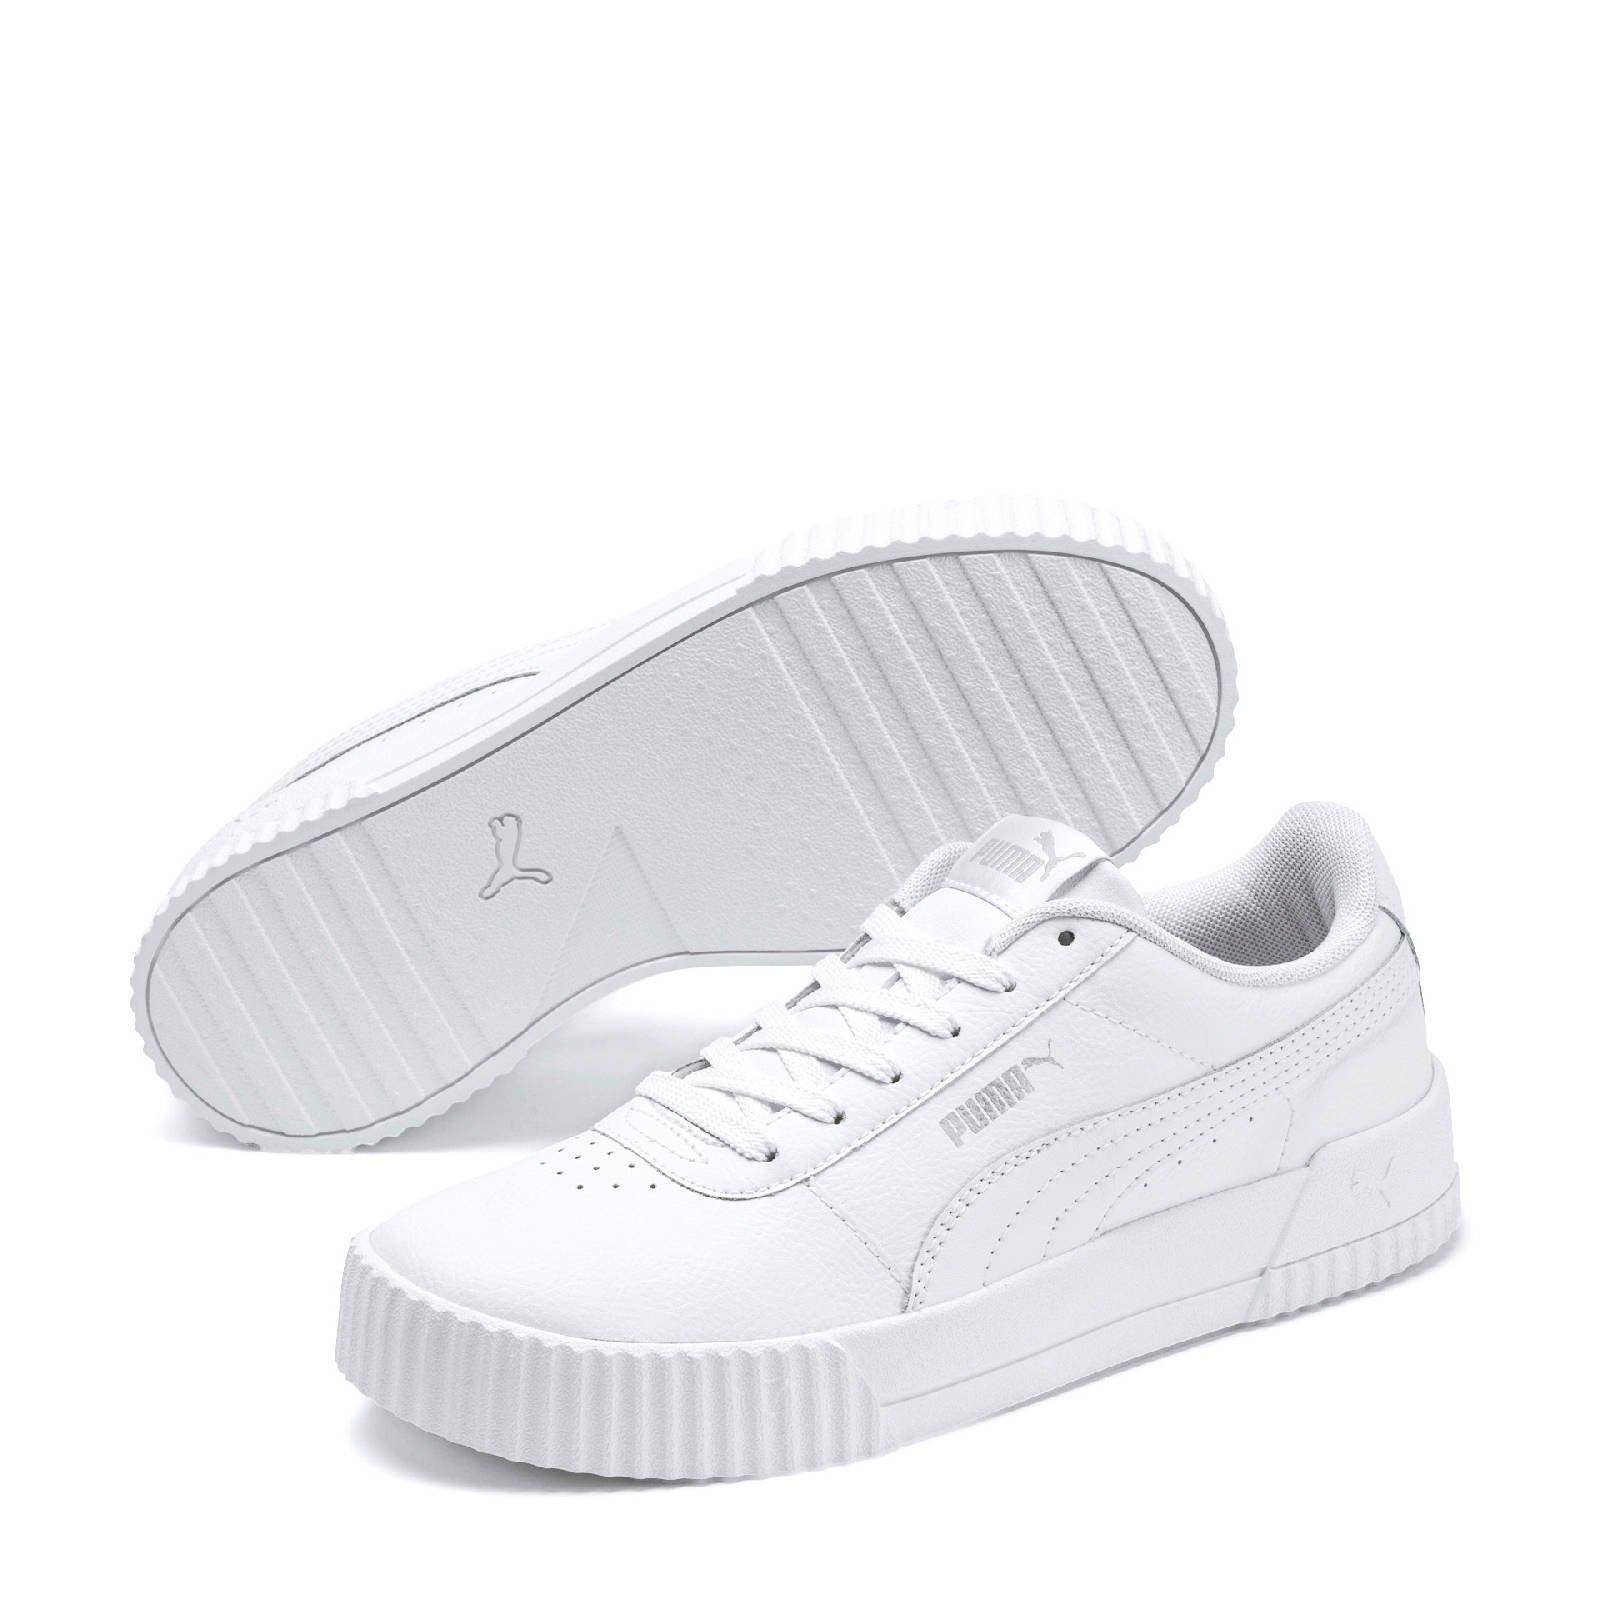 Puma Carina L sneakers wit | wehkamp